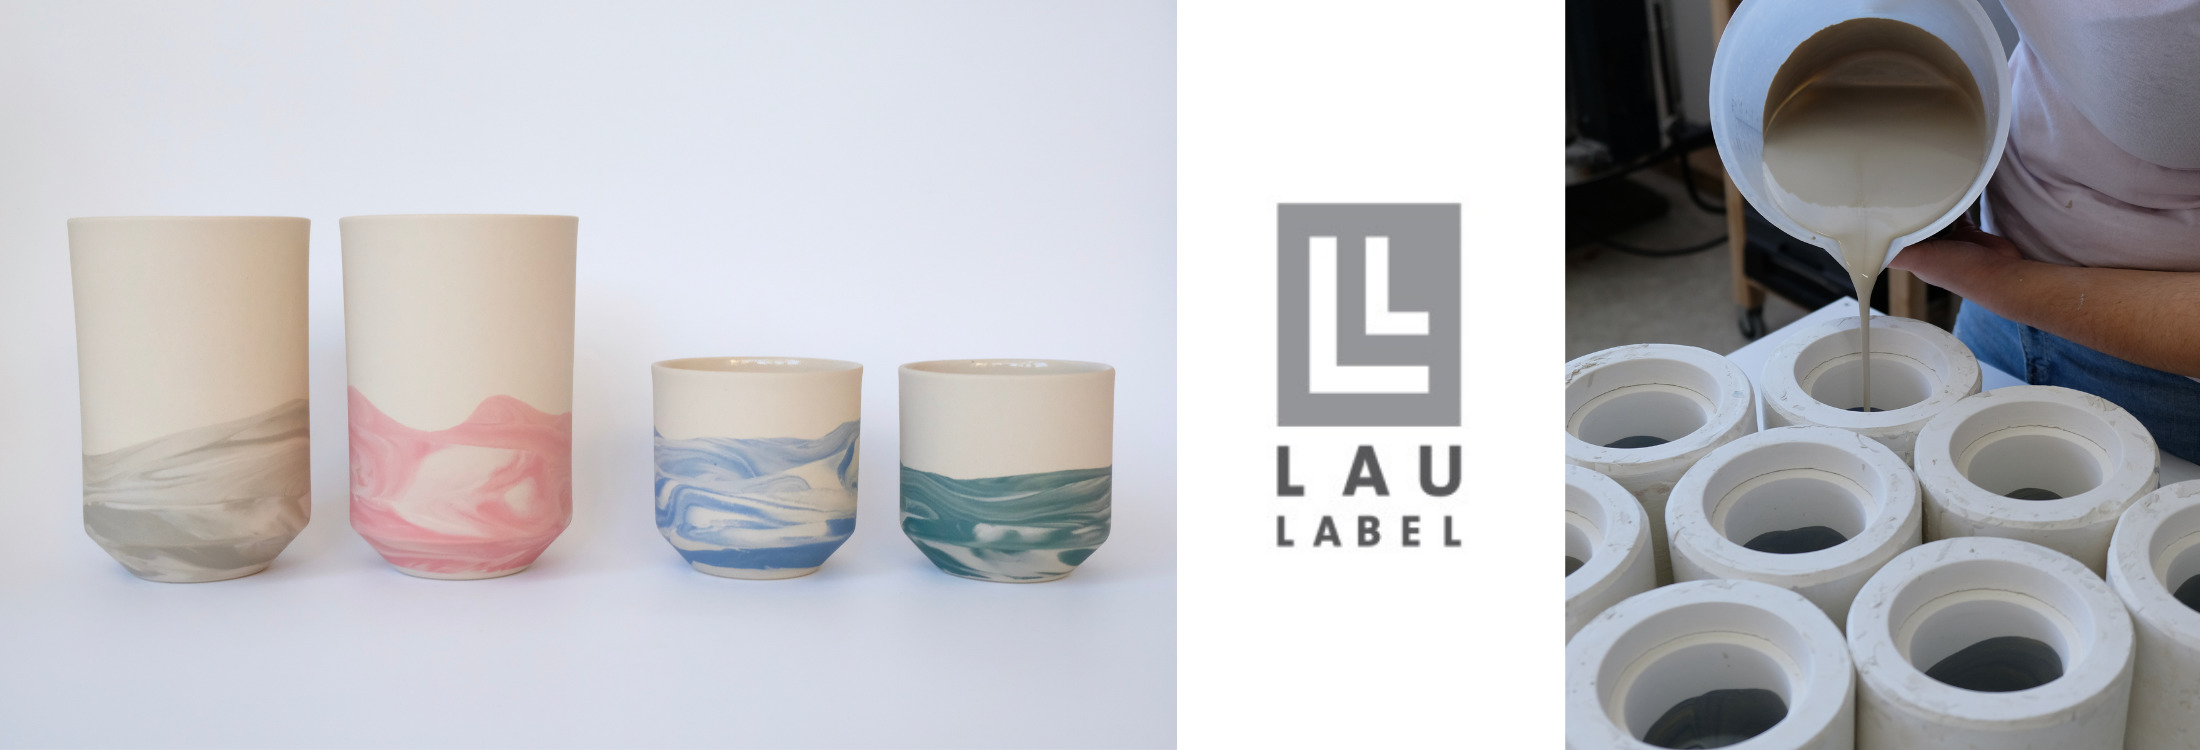 LauLabel